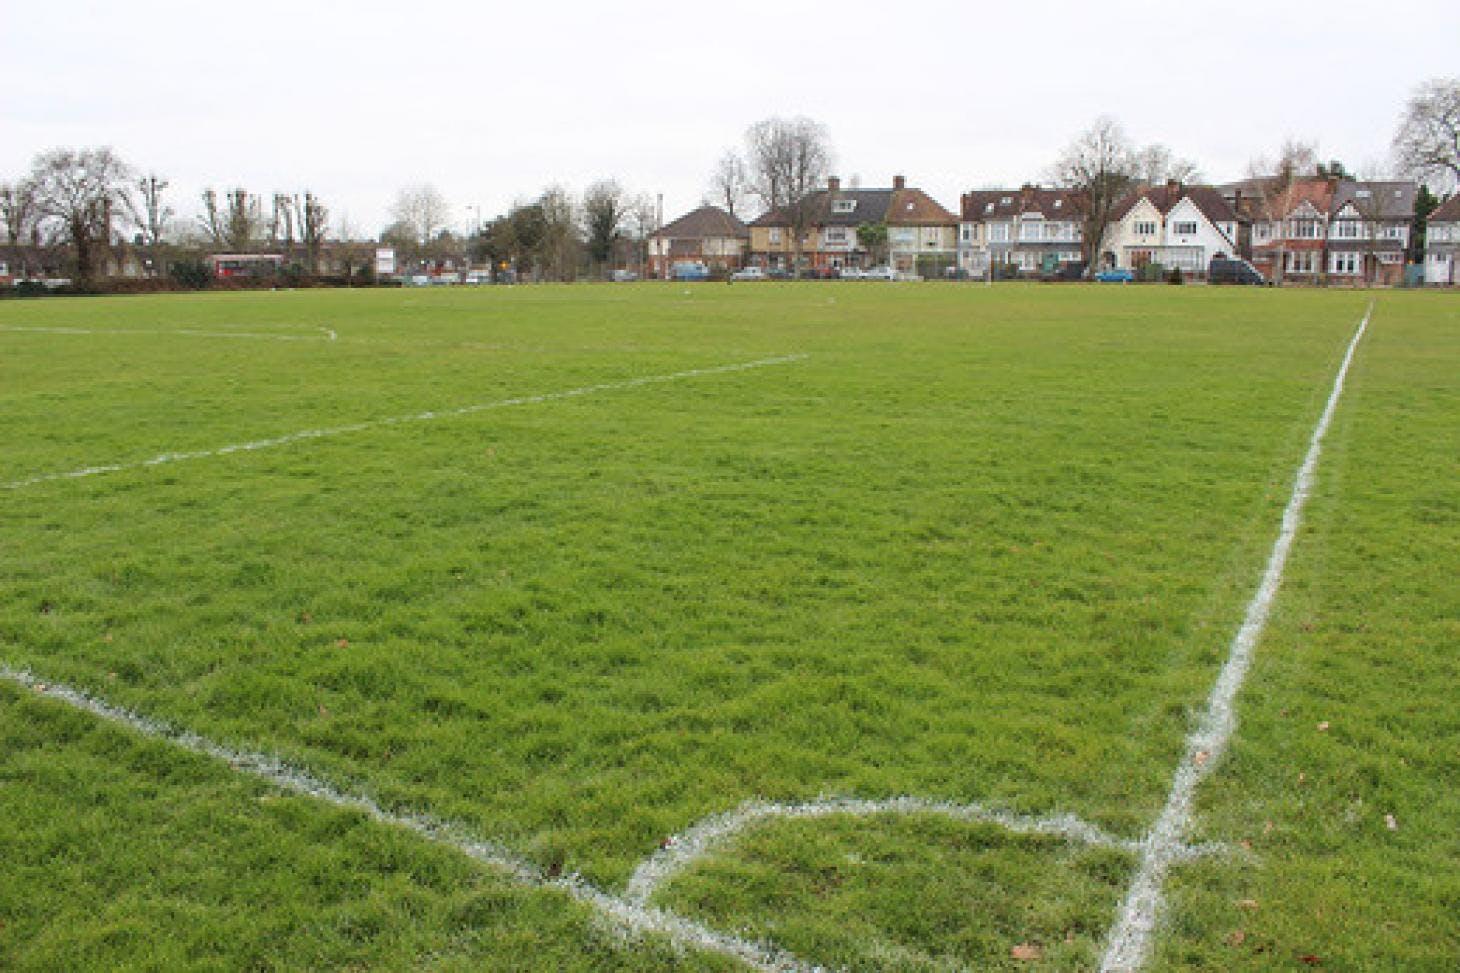 Trinity School, Belvedere 11 a side | Grass football pitch